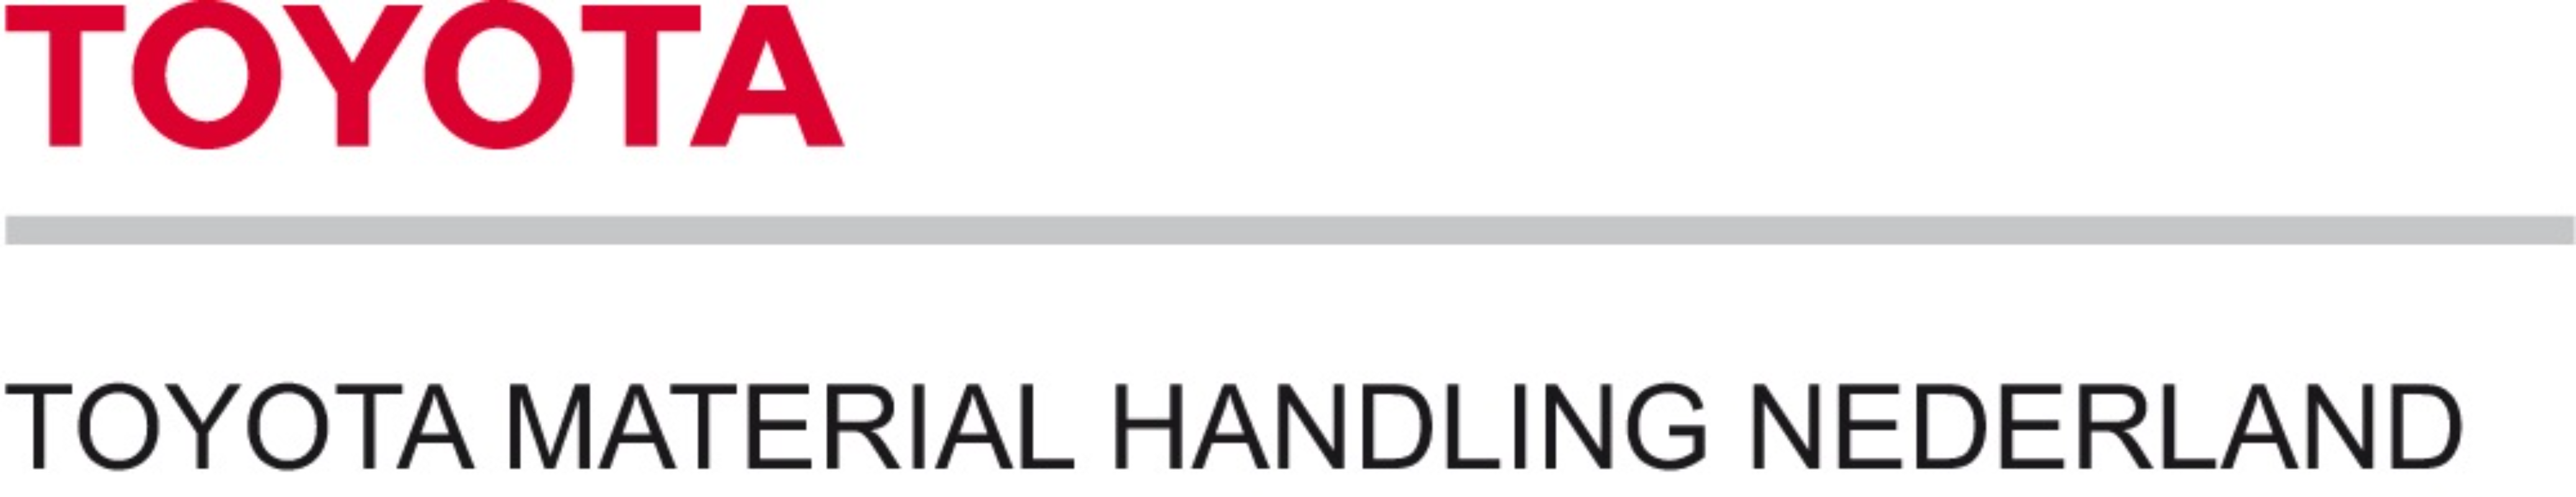 Toyota Material Handling BV (TMH) logo